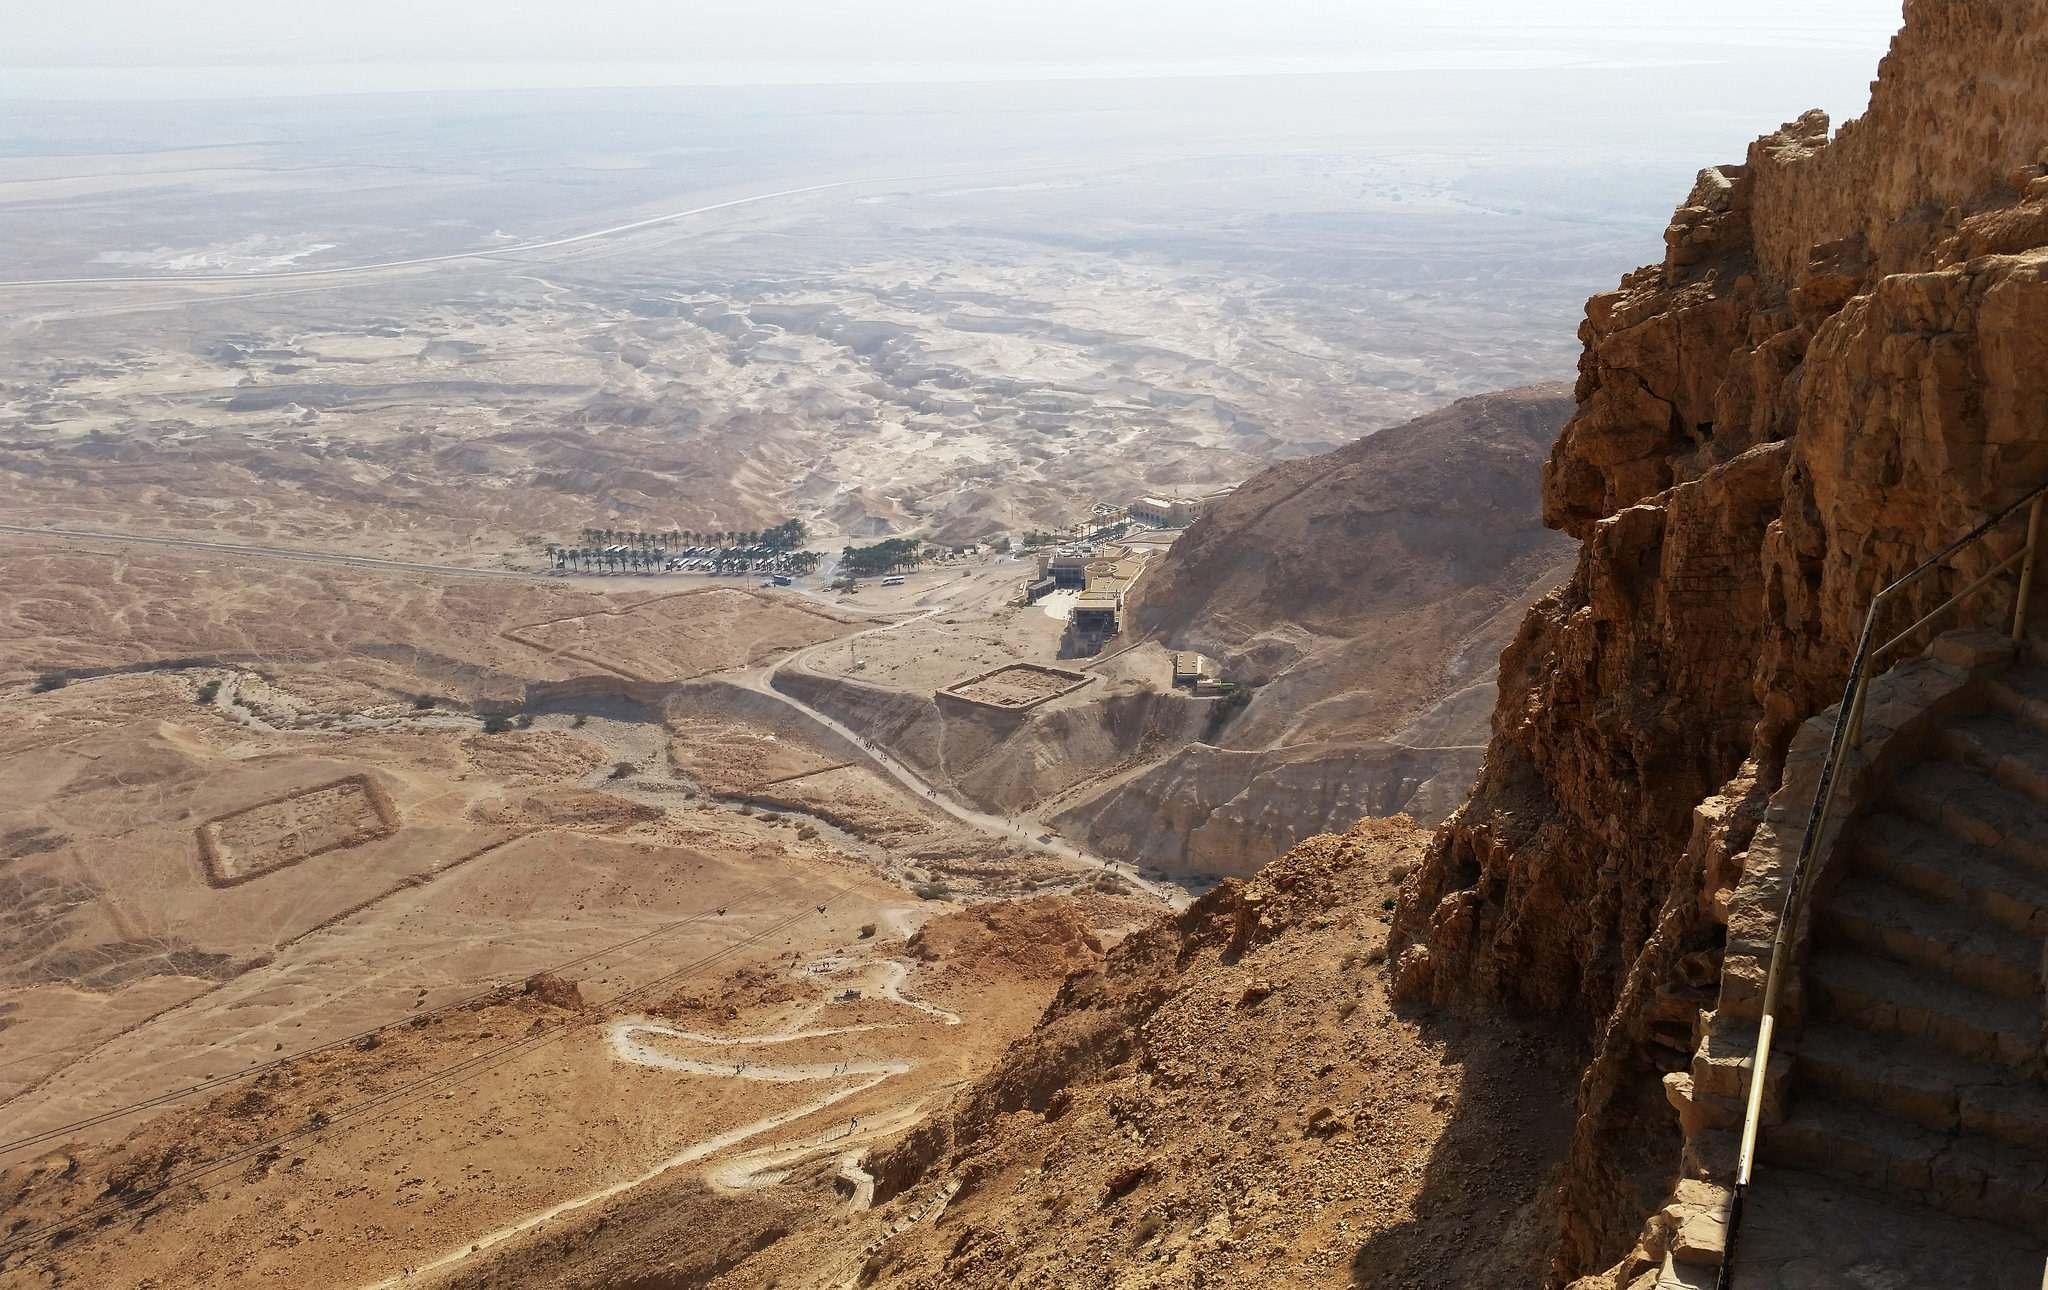 masada4 Masada Desert Fortress in Israel